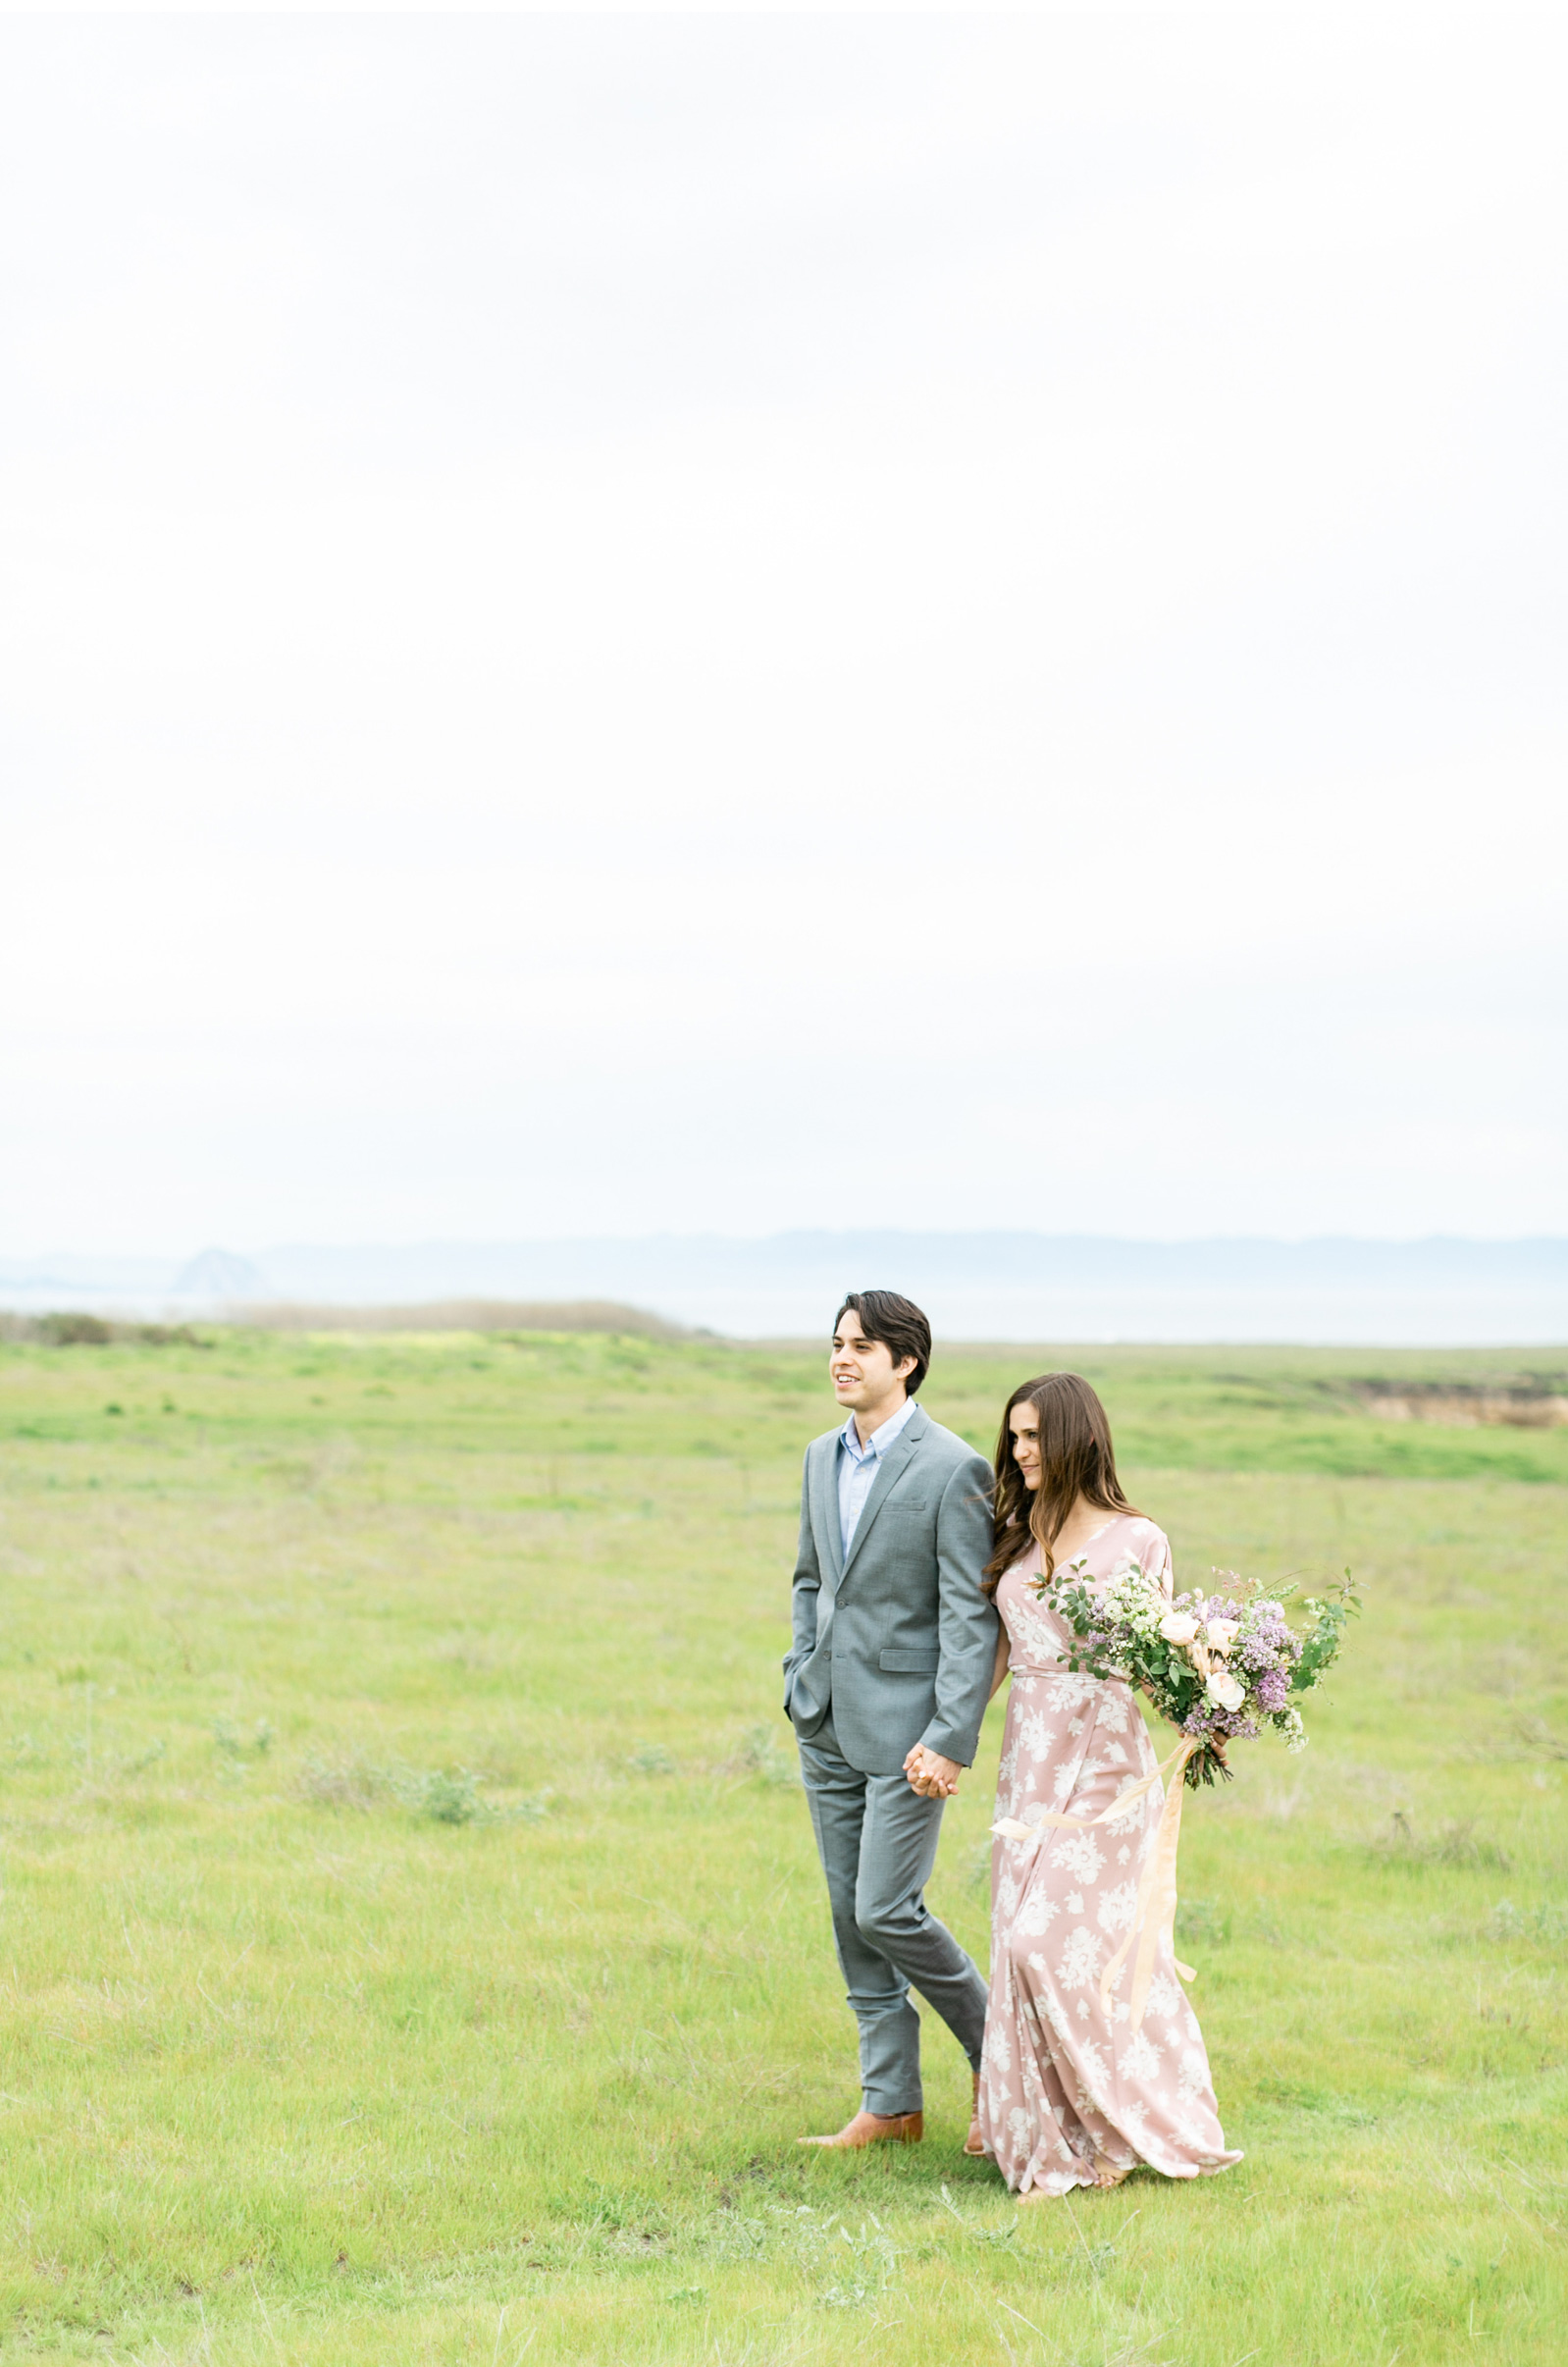 Saddlerock-Ranch-Malibu-Wedding-Natalie-Schutt-Photography-Romantic-Florals-Rolling-Hills-Engagement_06.jpg